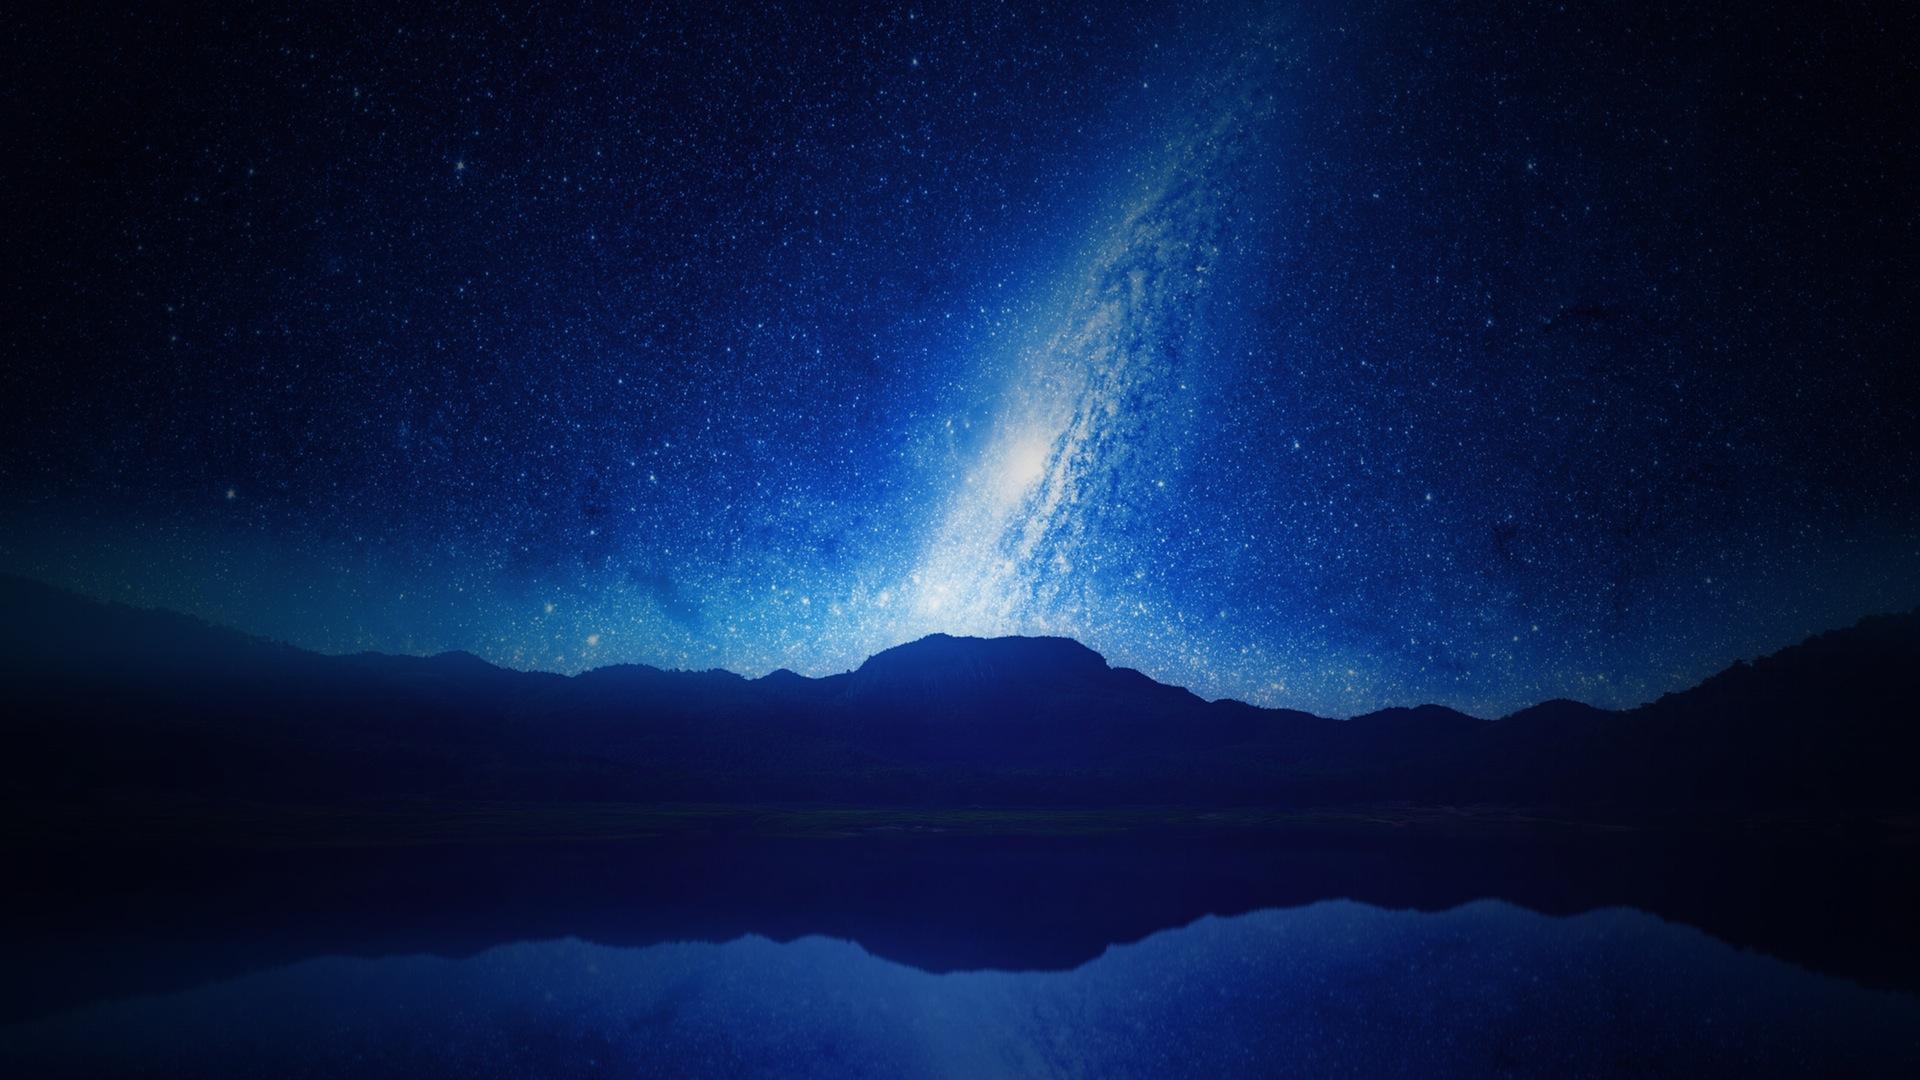 Cielo, notte, Star, montagne, firmamento, Galaxy, Via Lattea - Sfondi HD - Professor-falken.com